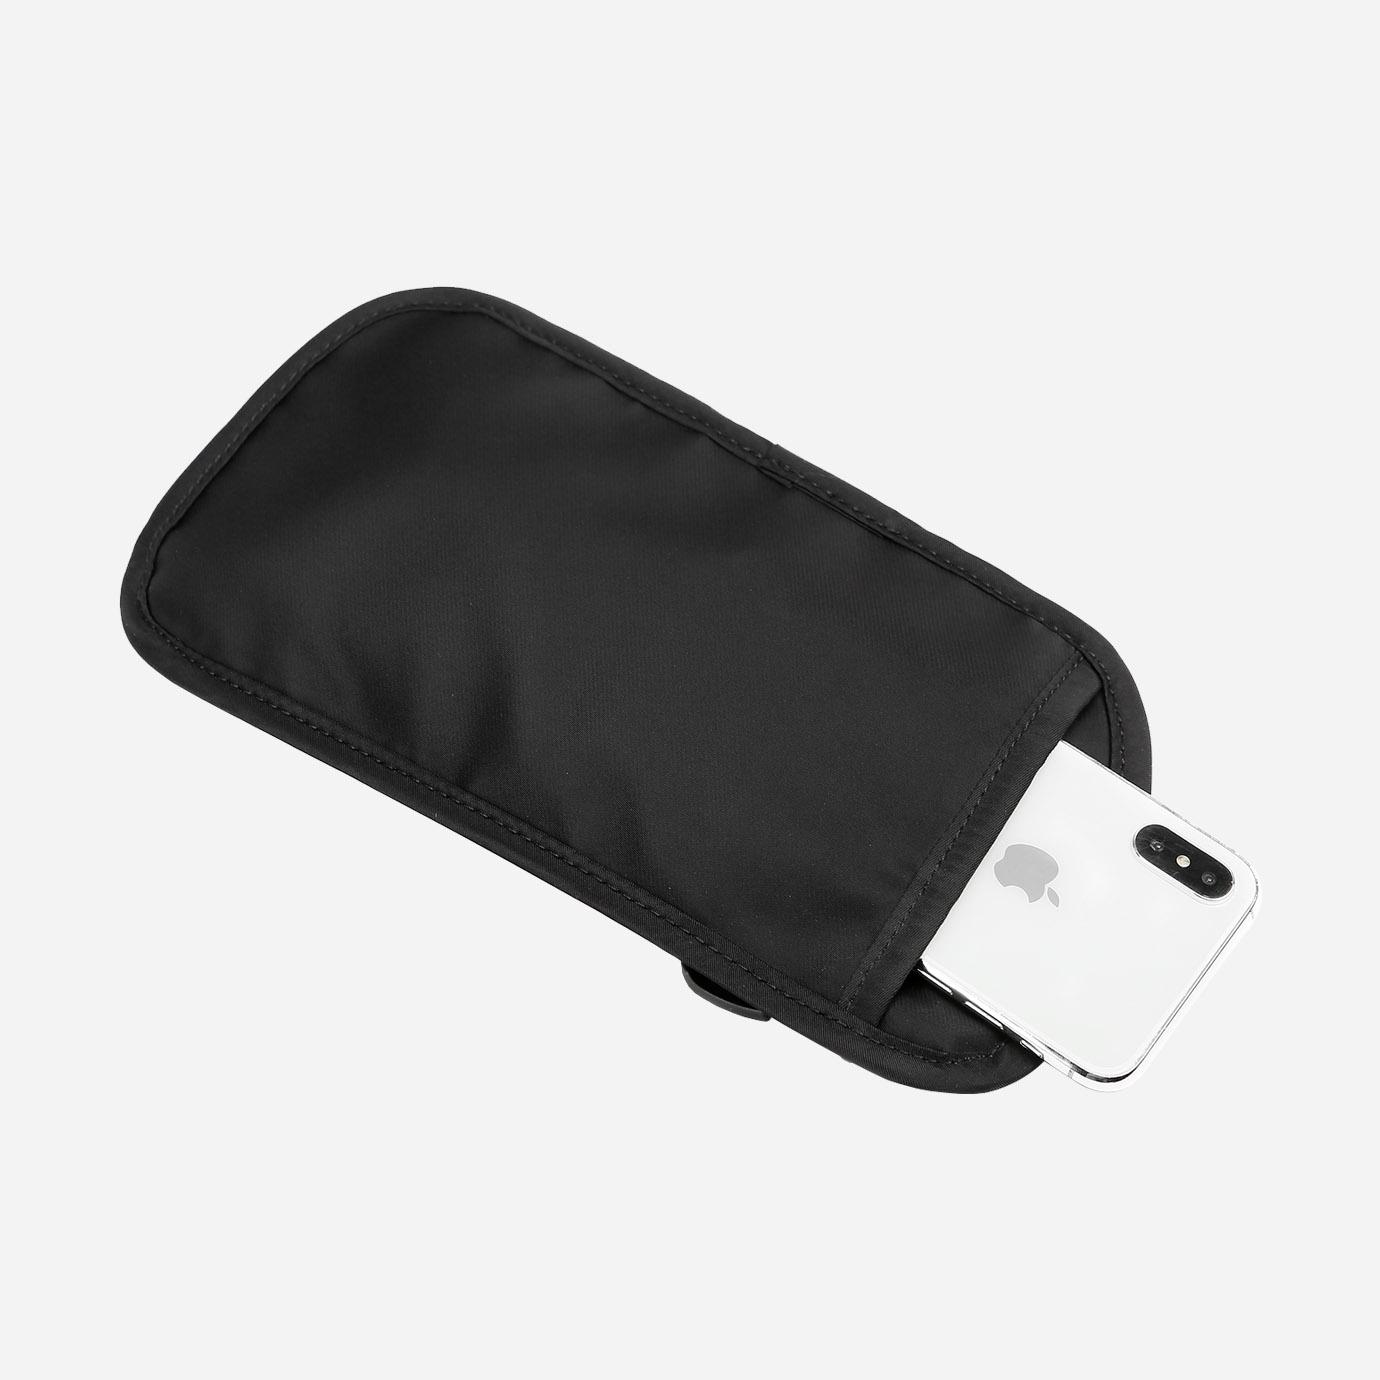 Nordace Gisborne – Anti Theft Waist Bag (Bundle Special)